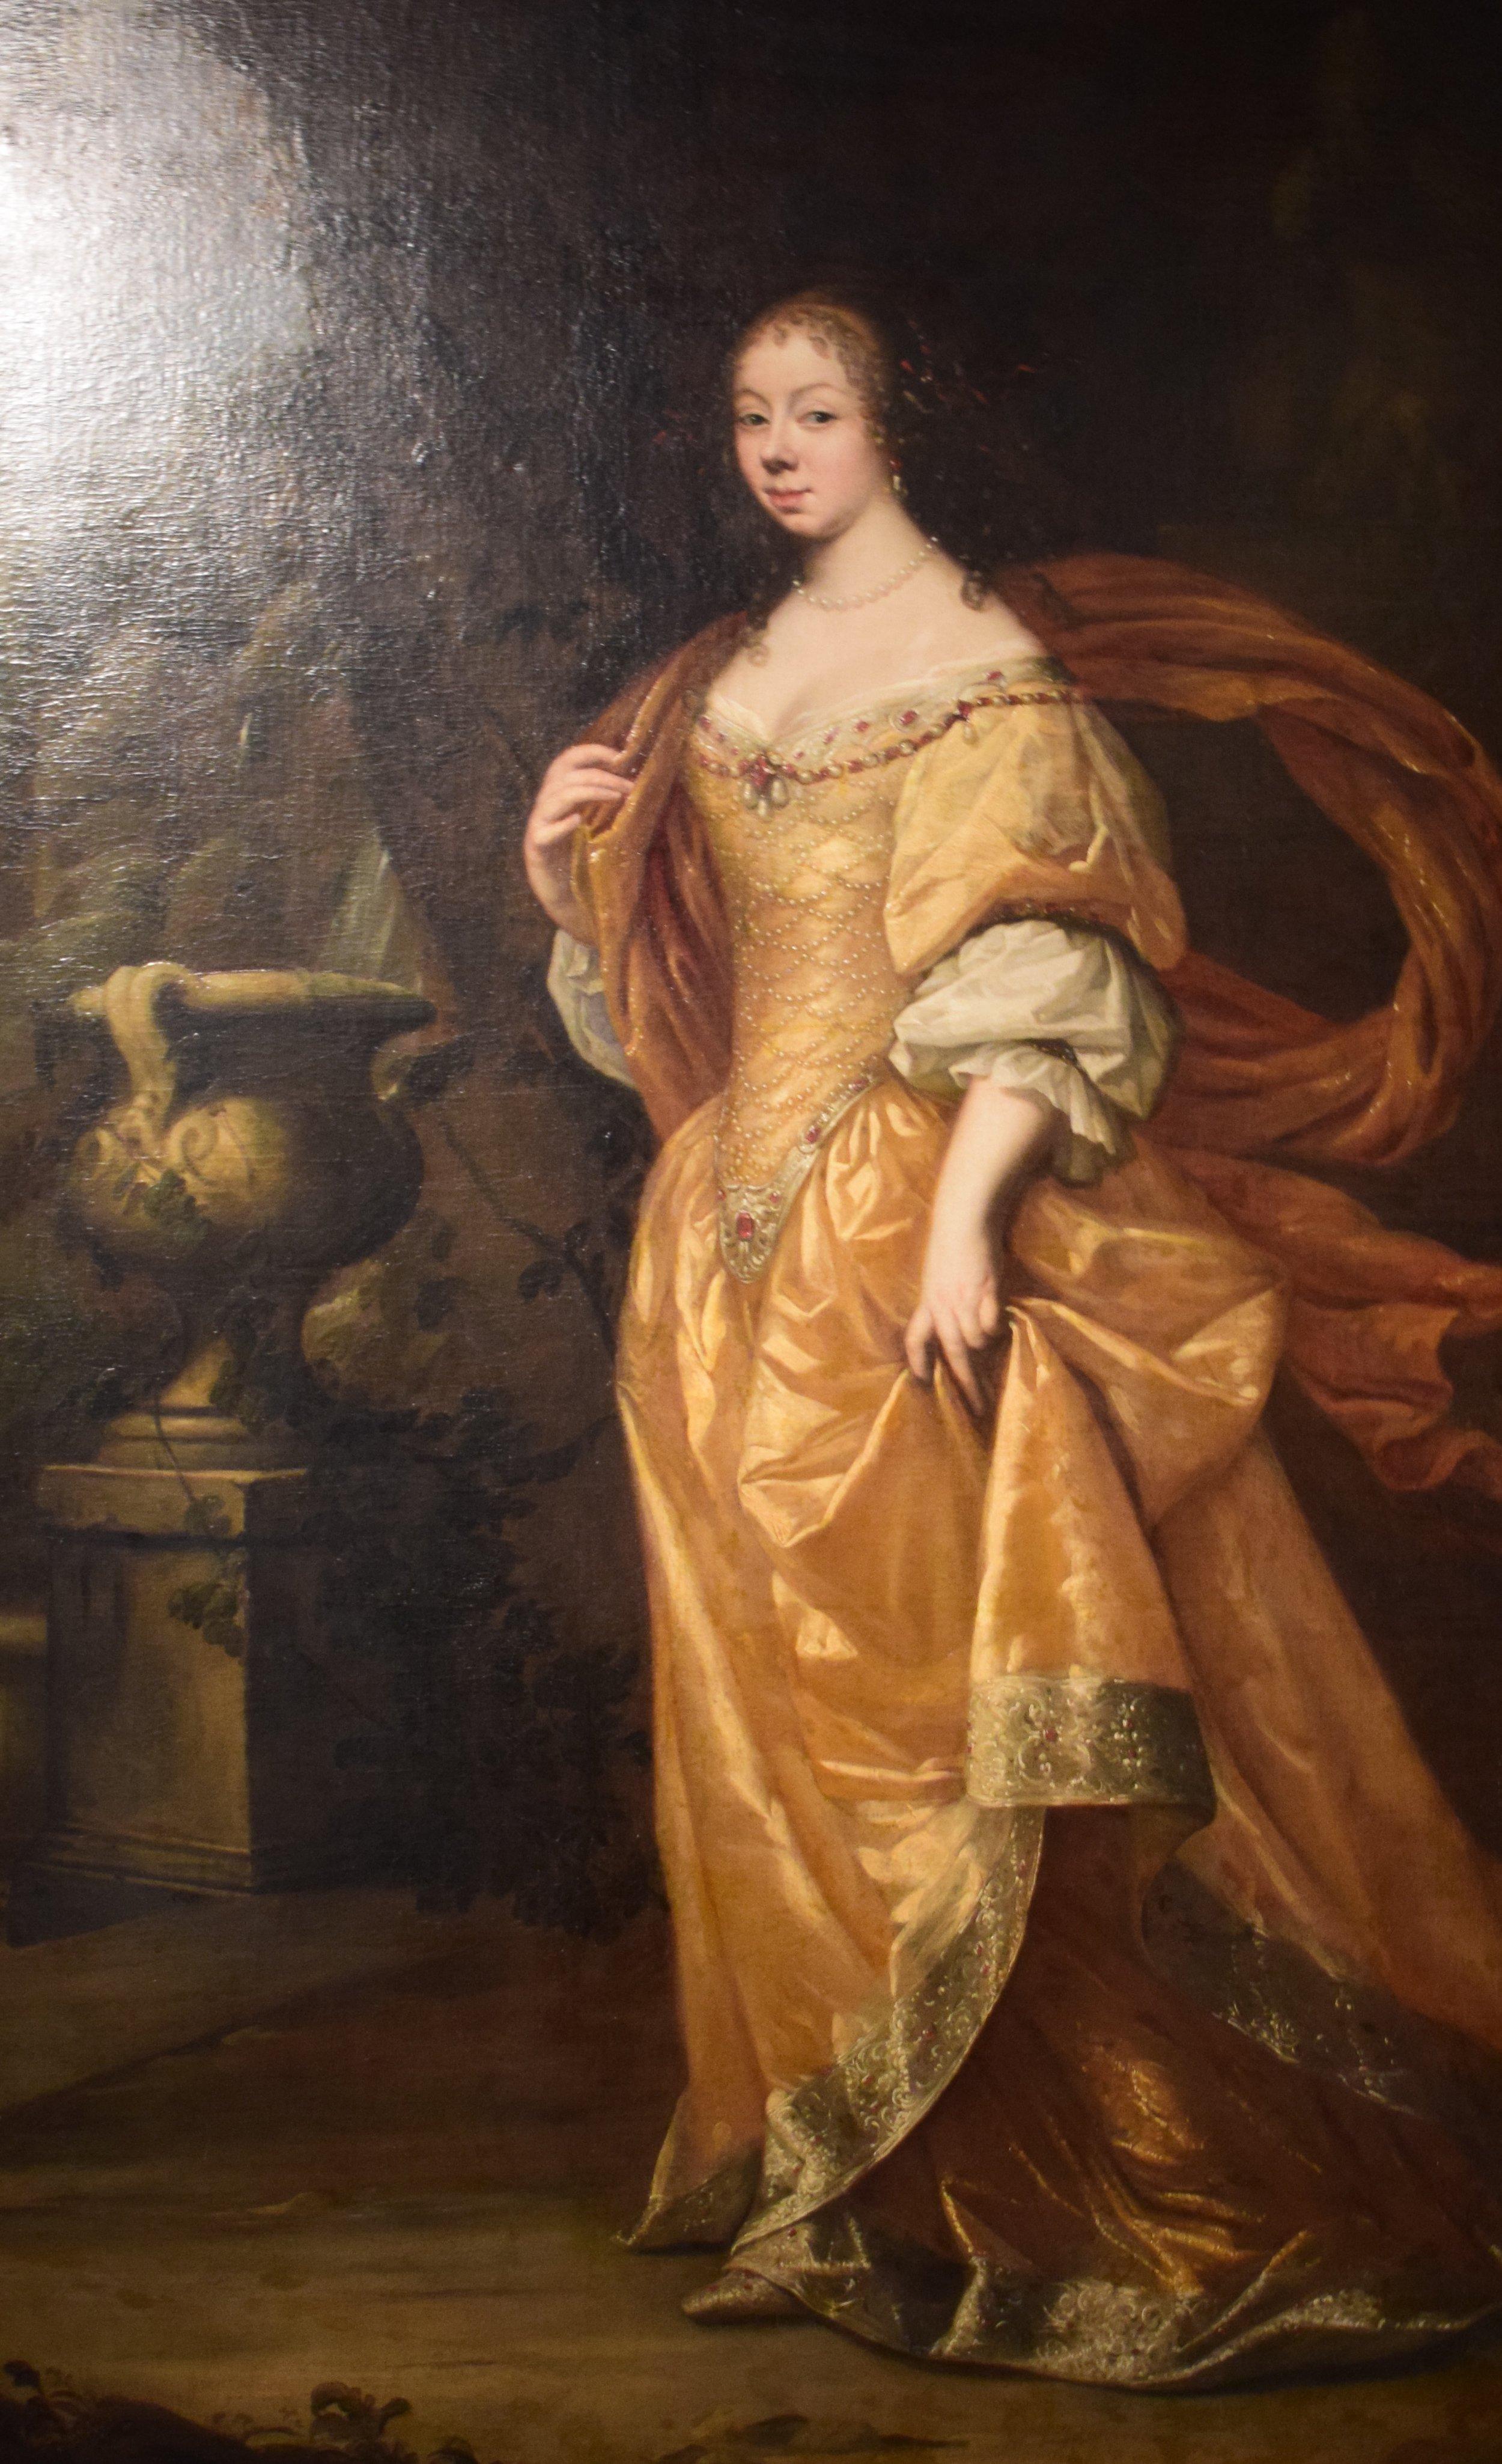 David Klöcker Ehrenstrahl, Ingeborg Banér, ok. 1662